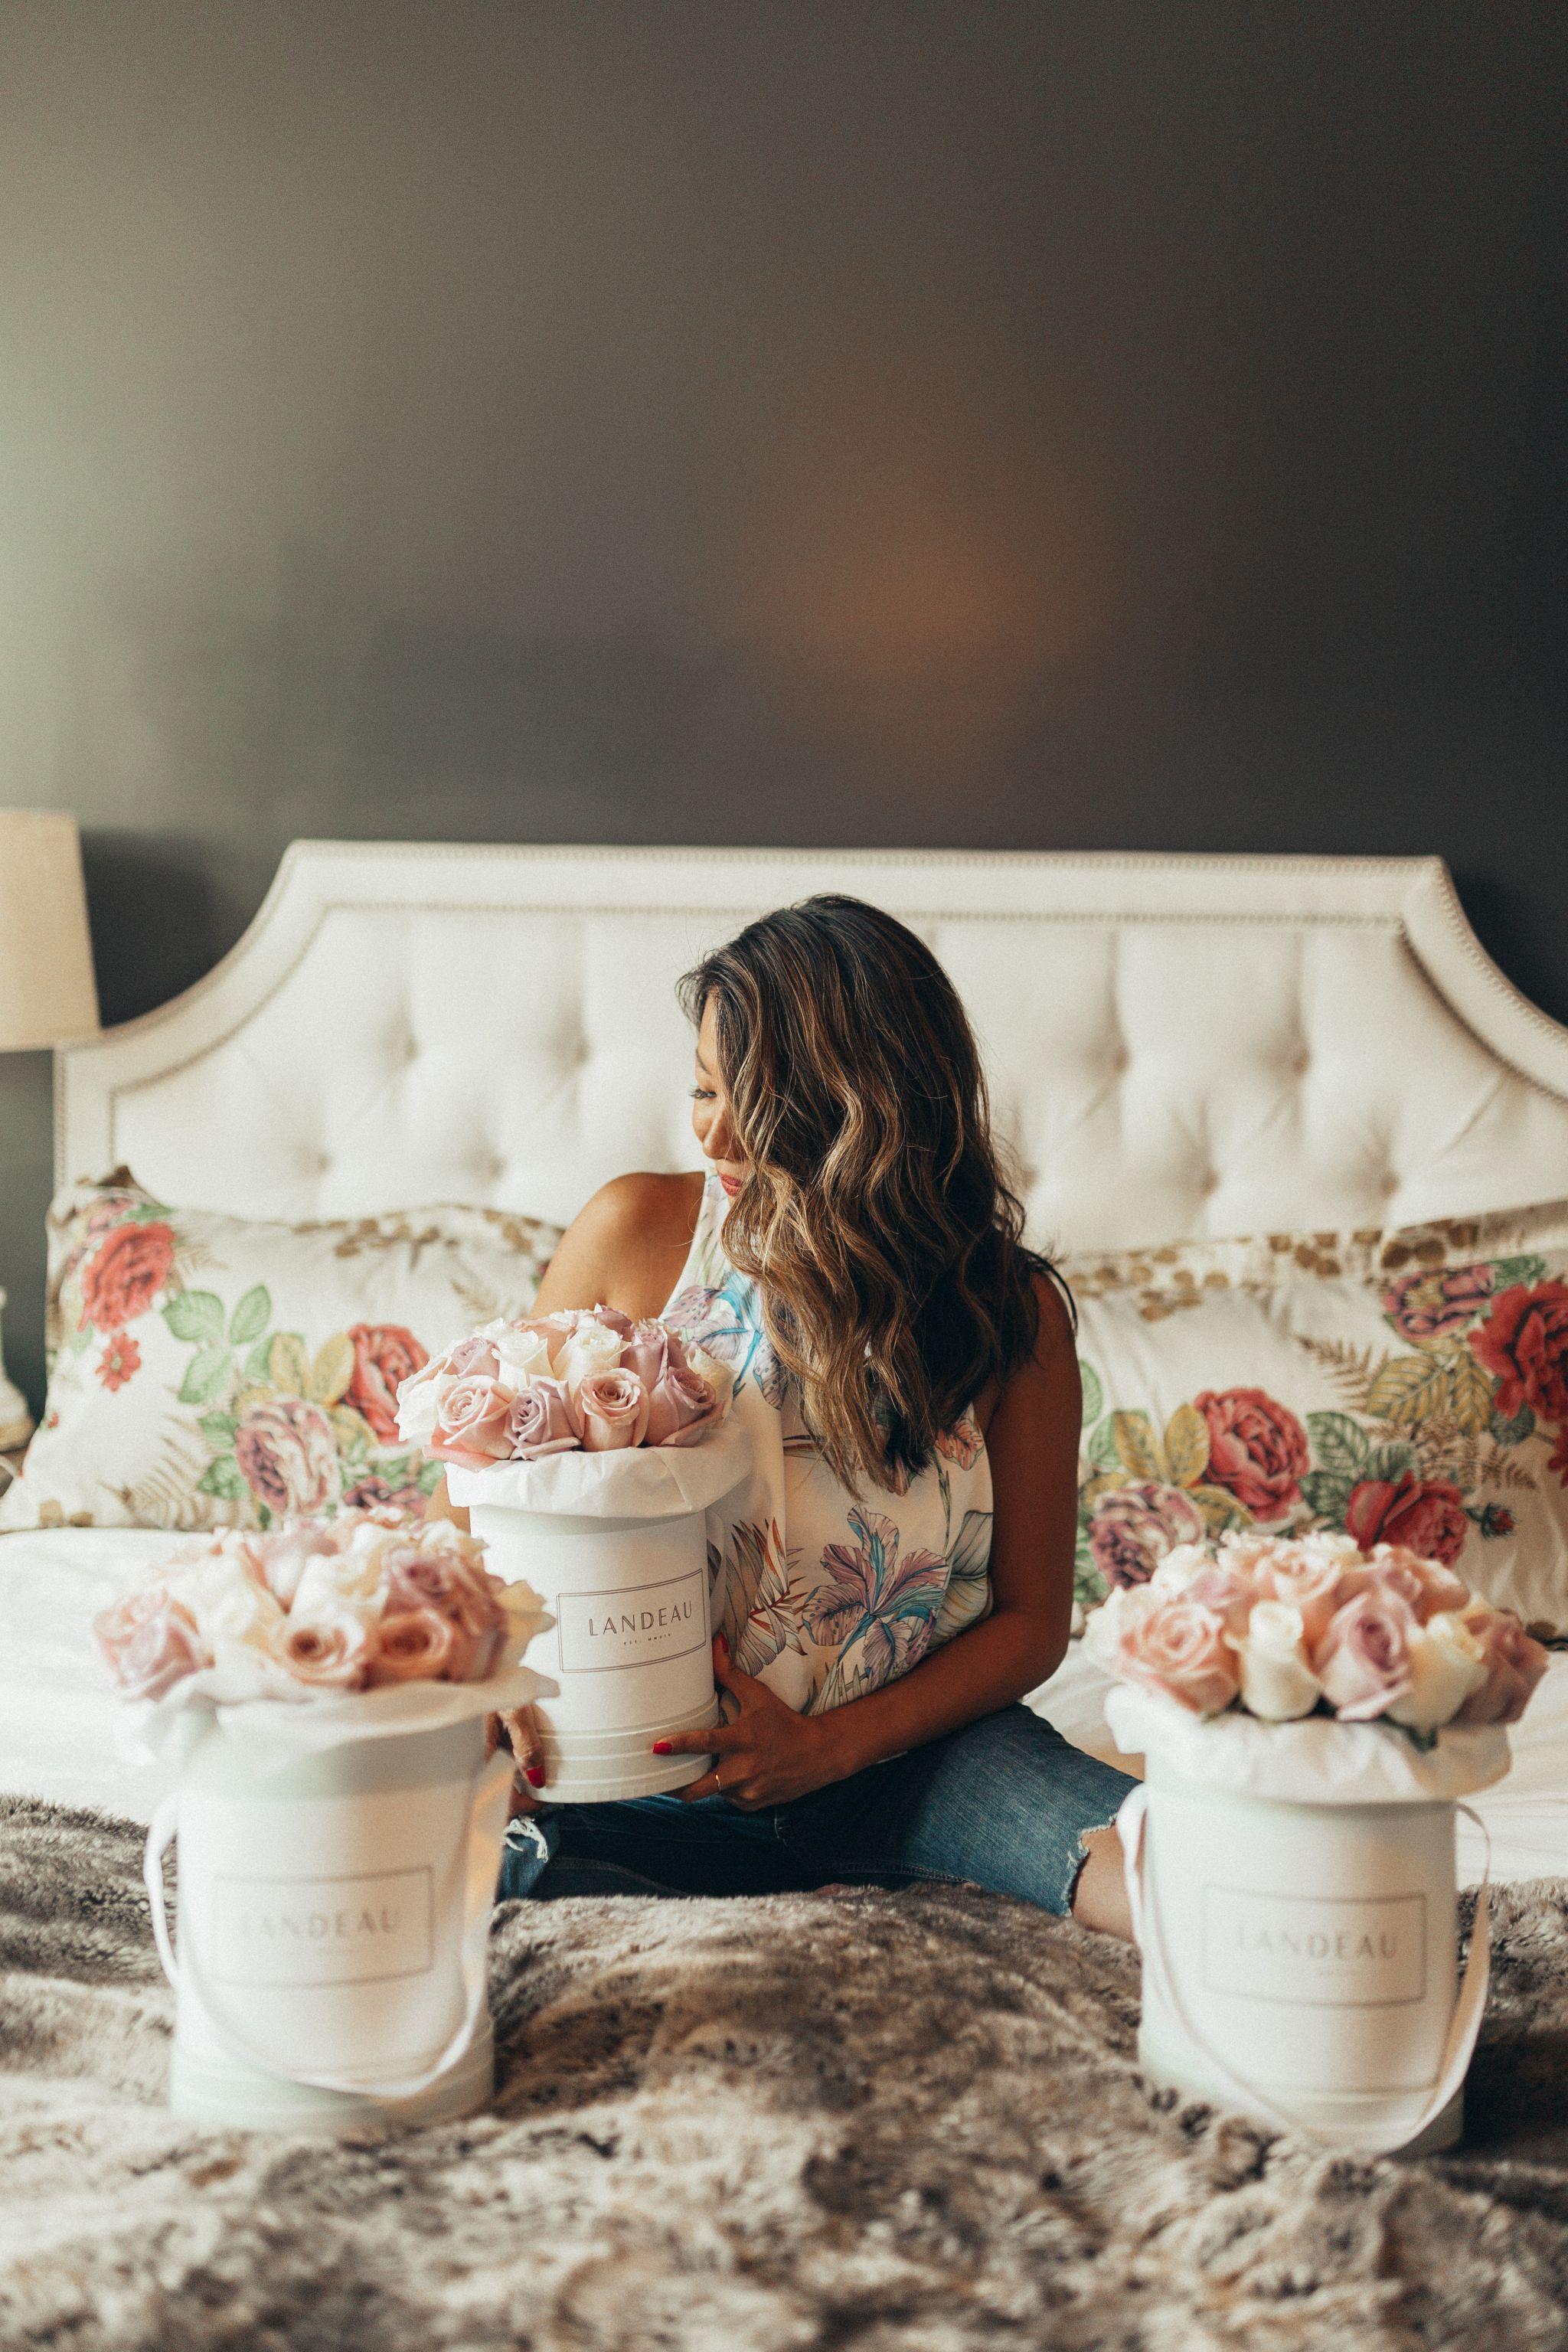 landeau flowers, Best flowers in a box, Jennifer Worman, Chicago LIfestyle, Best flowers for instagram